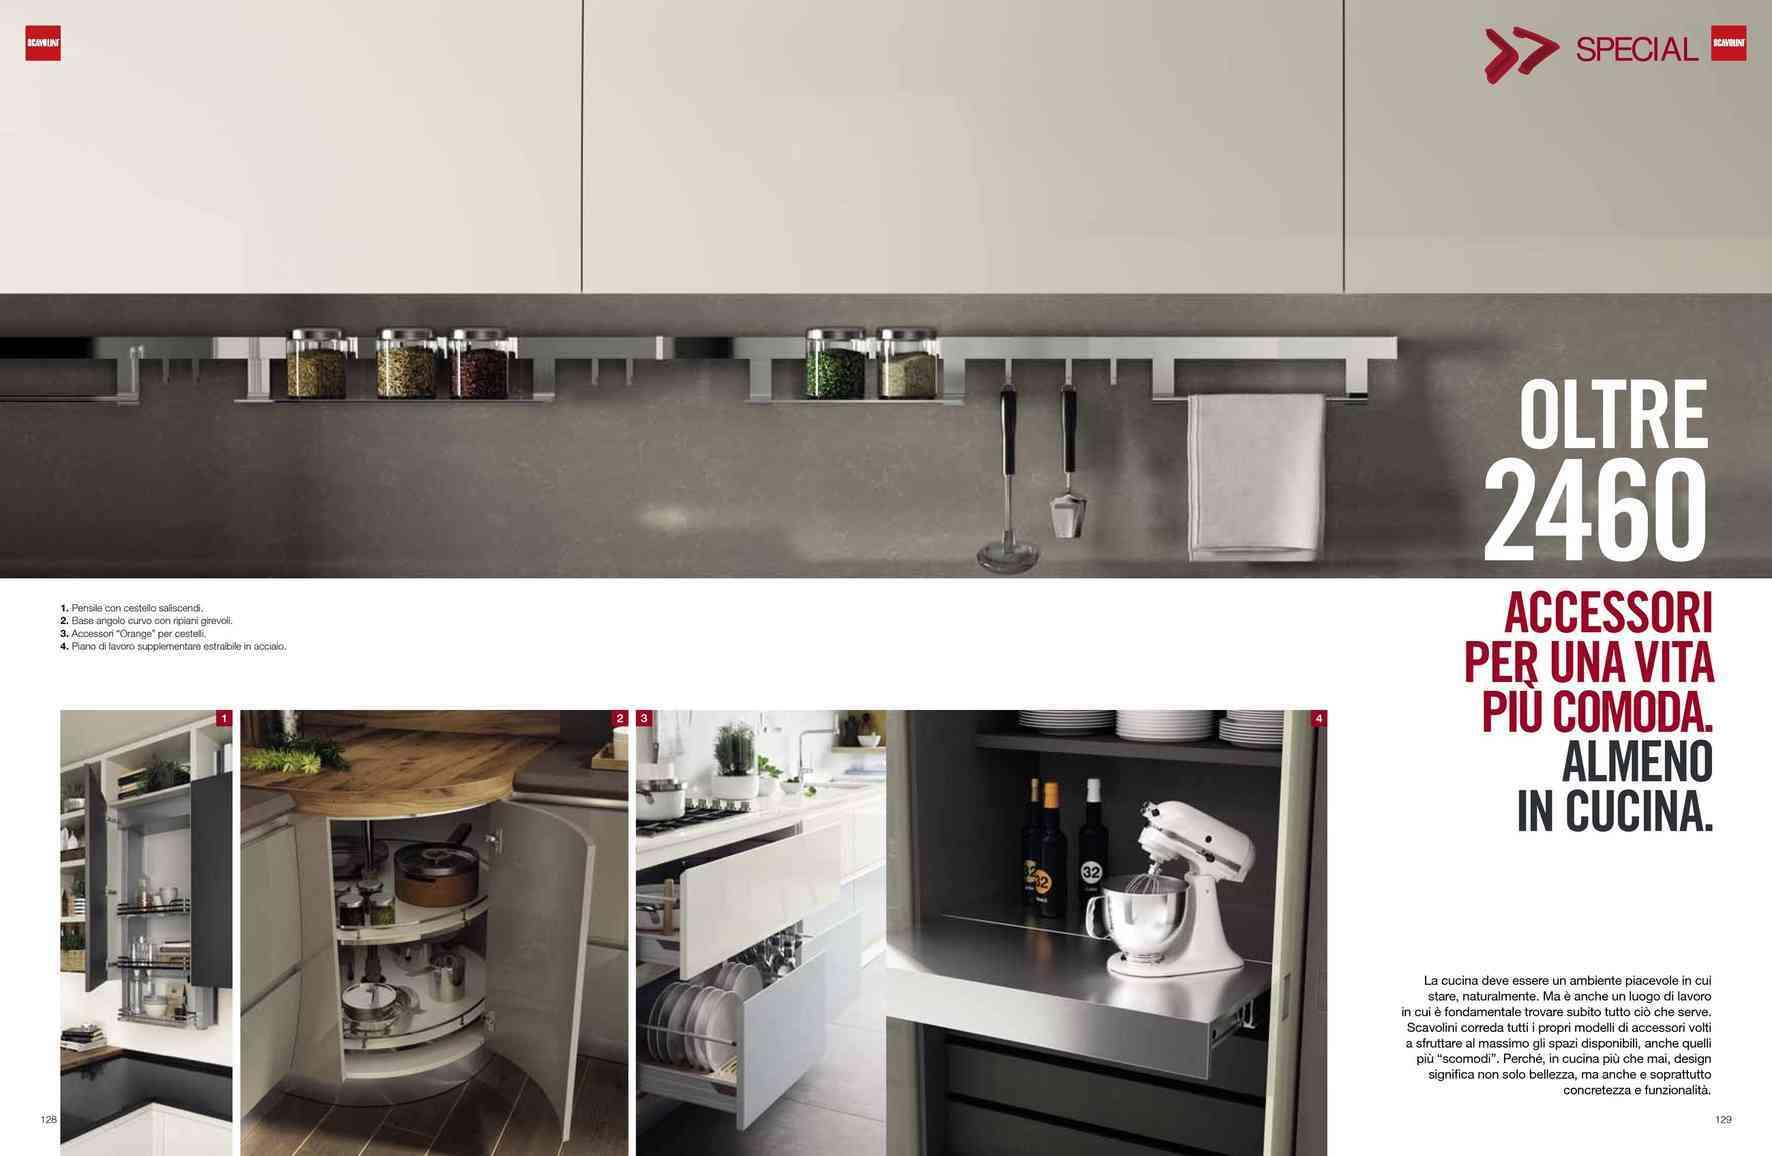 Pensile Angolare Cucina Ikea offerte pensili cucina, negozi per arredare casa - promoqui